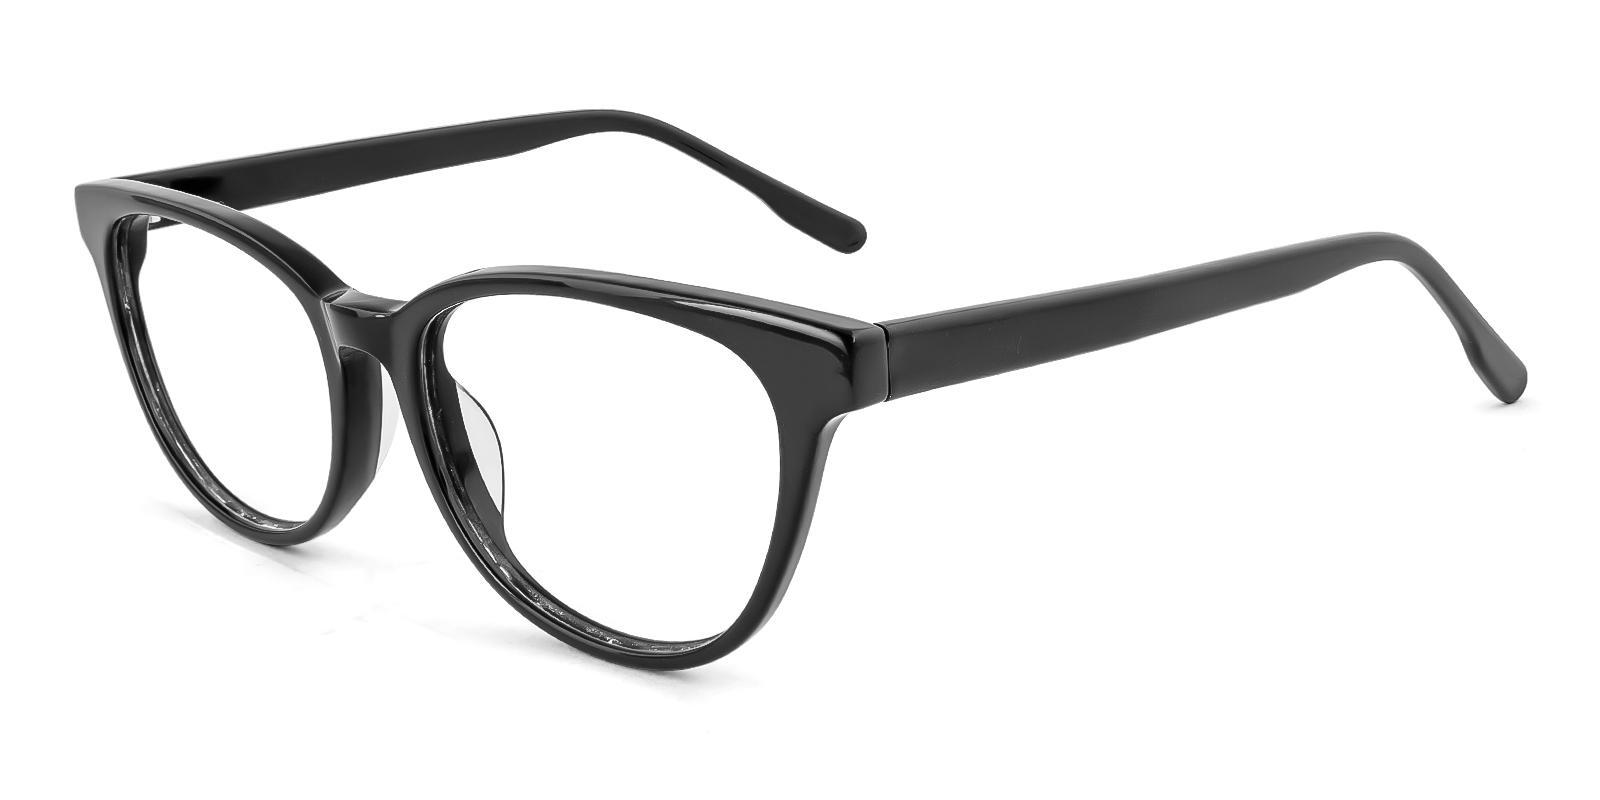 Bouquet Black Acetate Eyeglasses , SpringHinges , UniversalBridgeFit Frames from ABBE Glasses